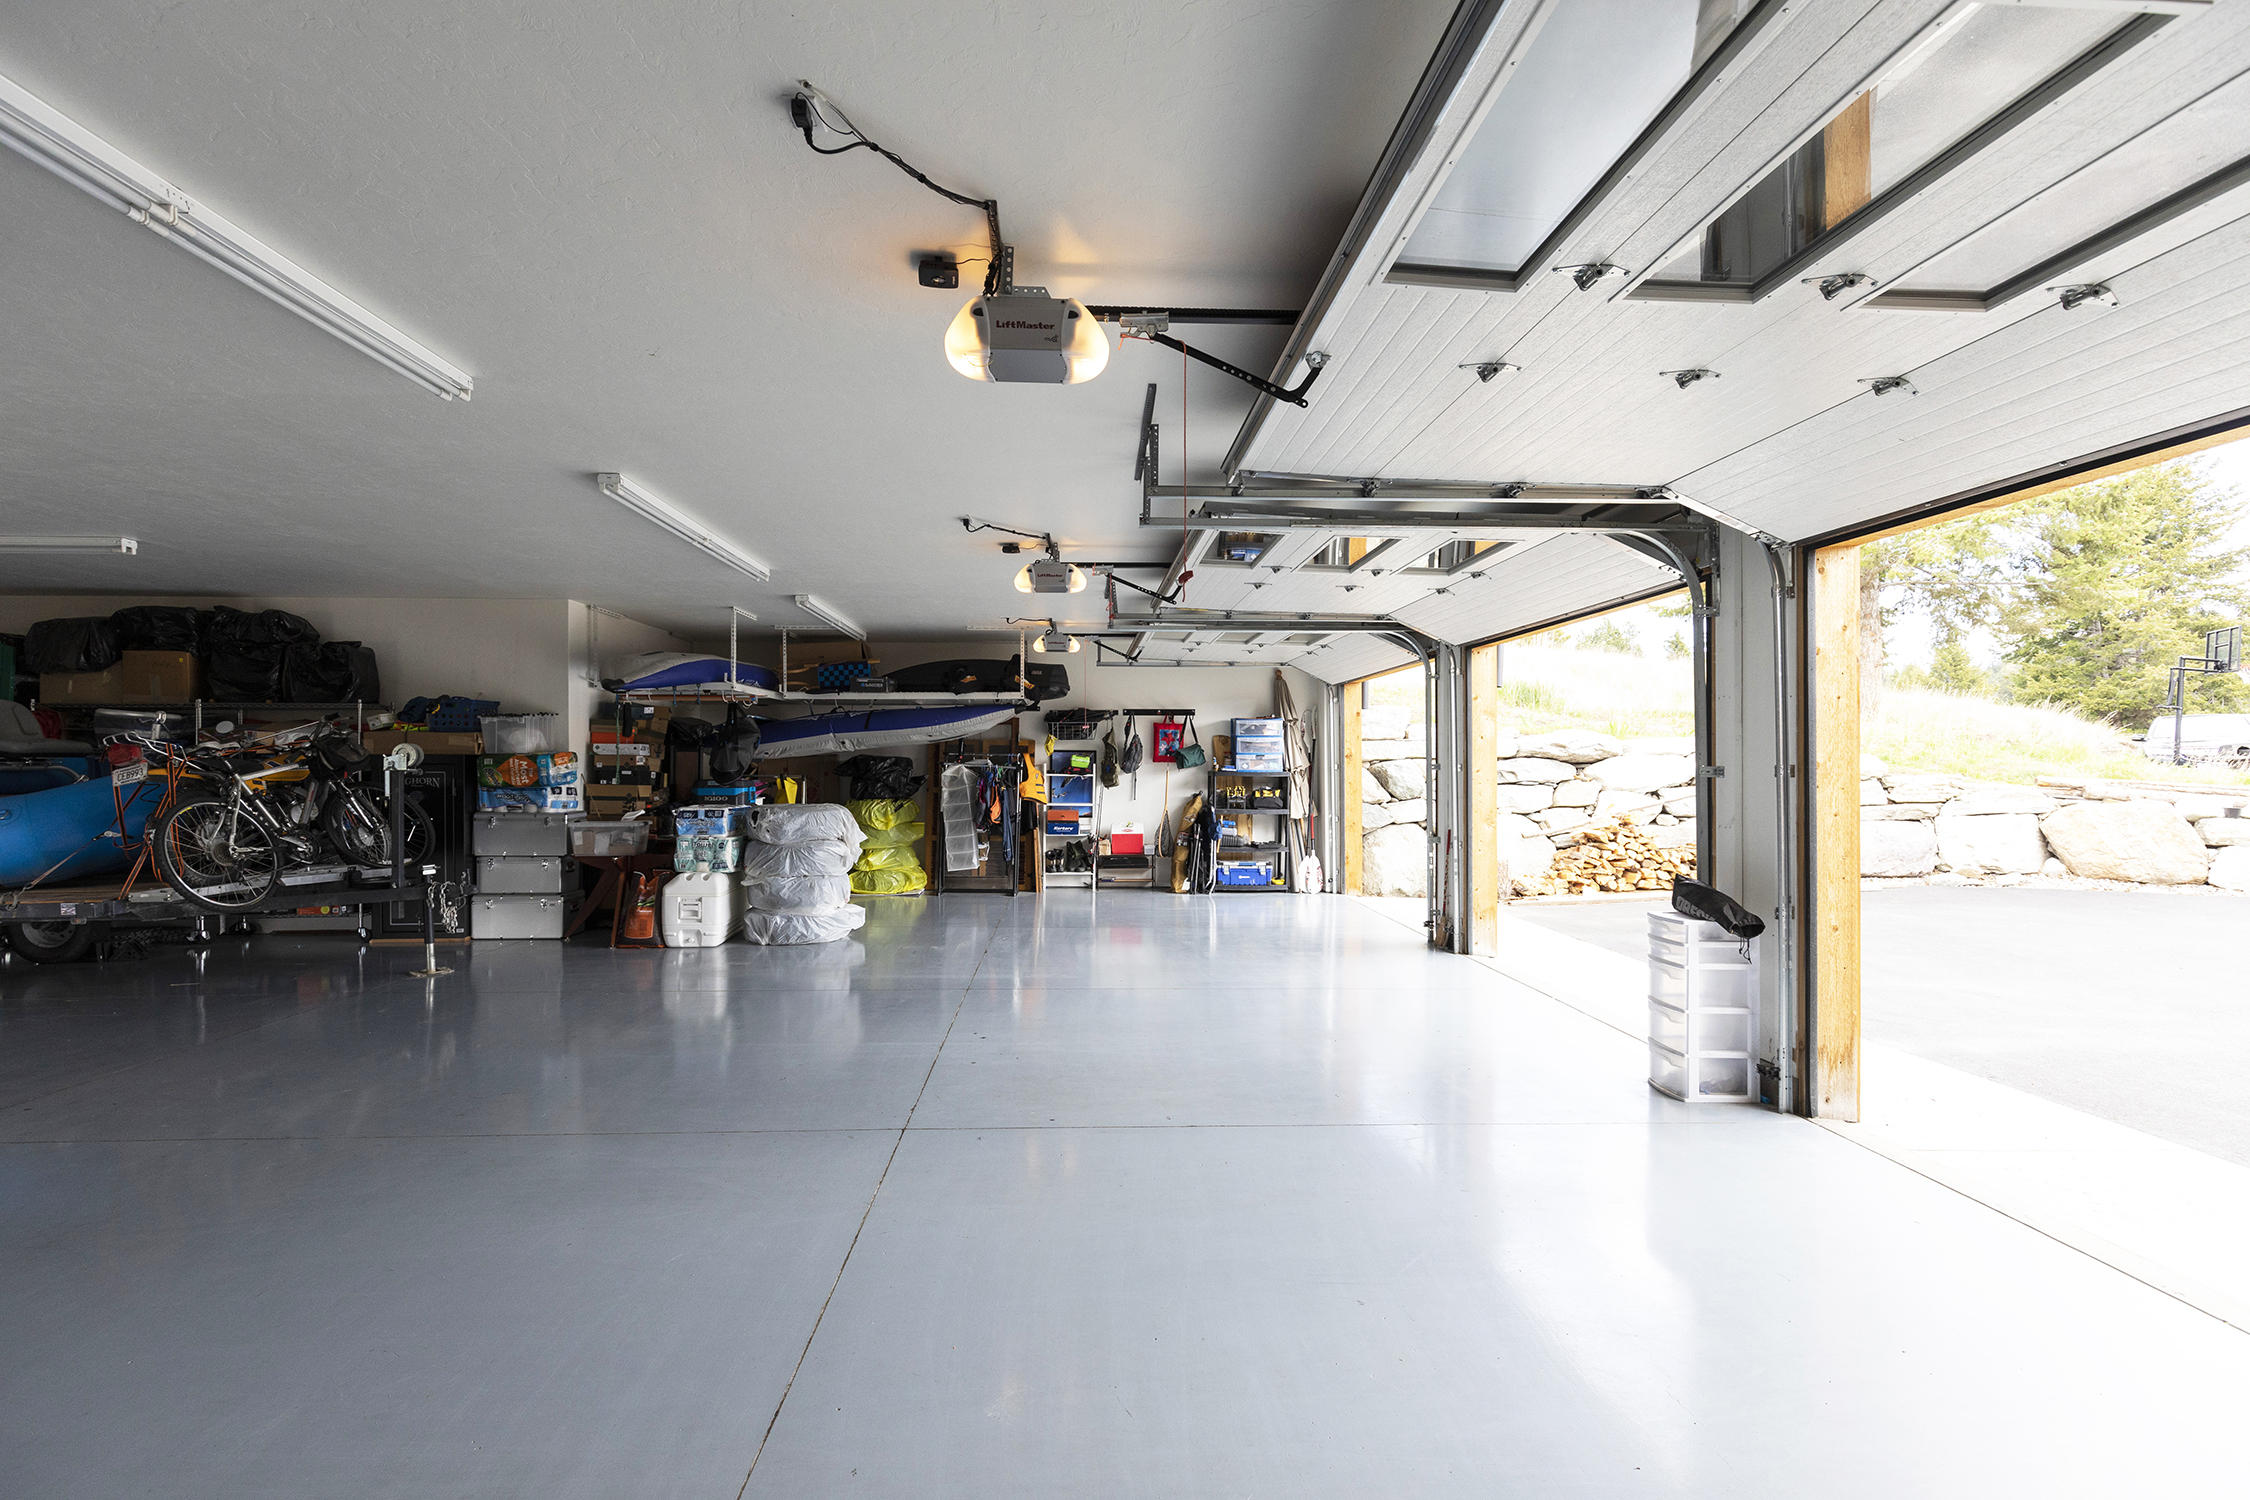 5 Car Garage